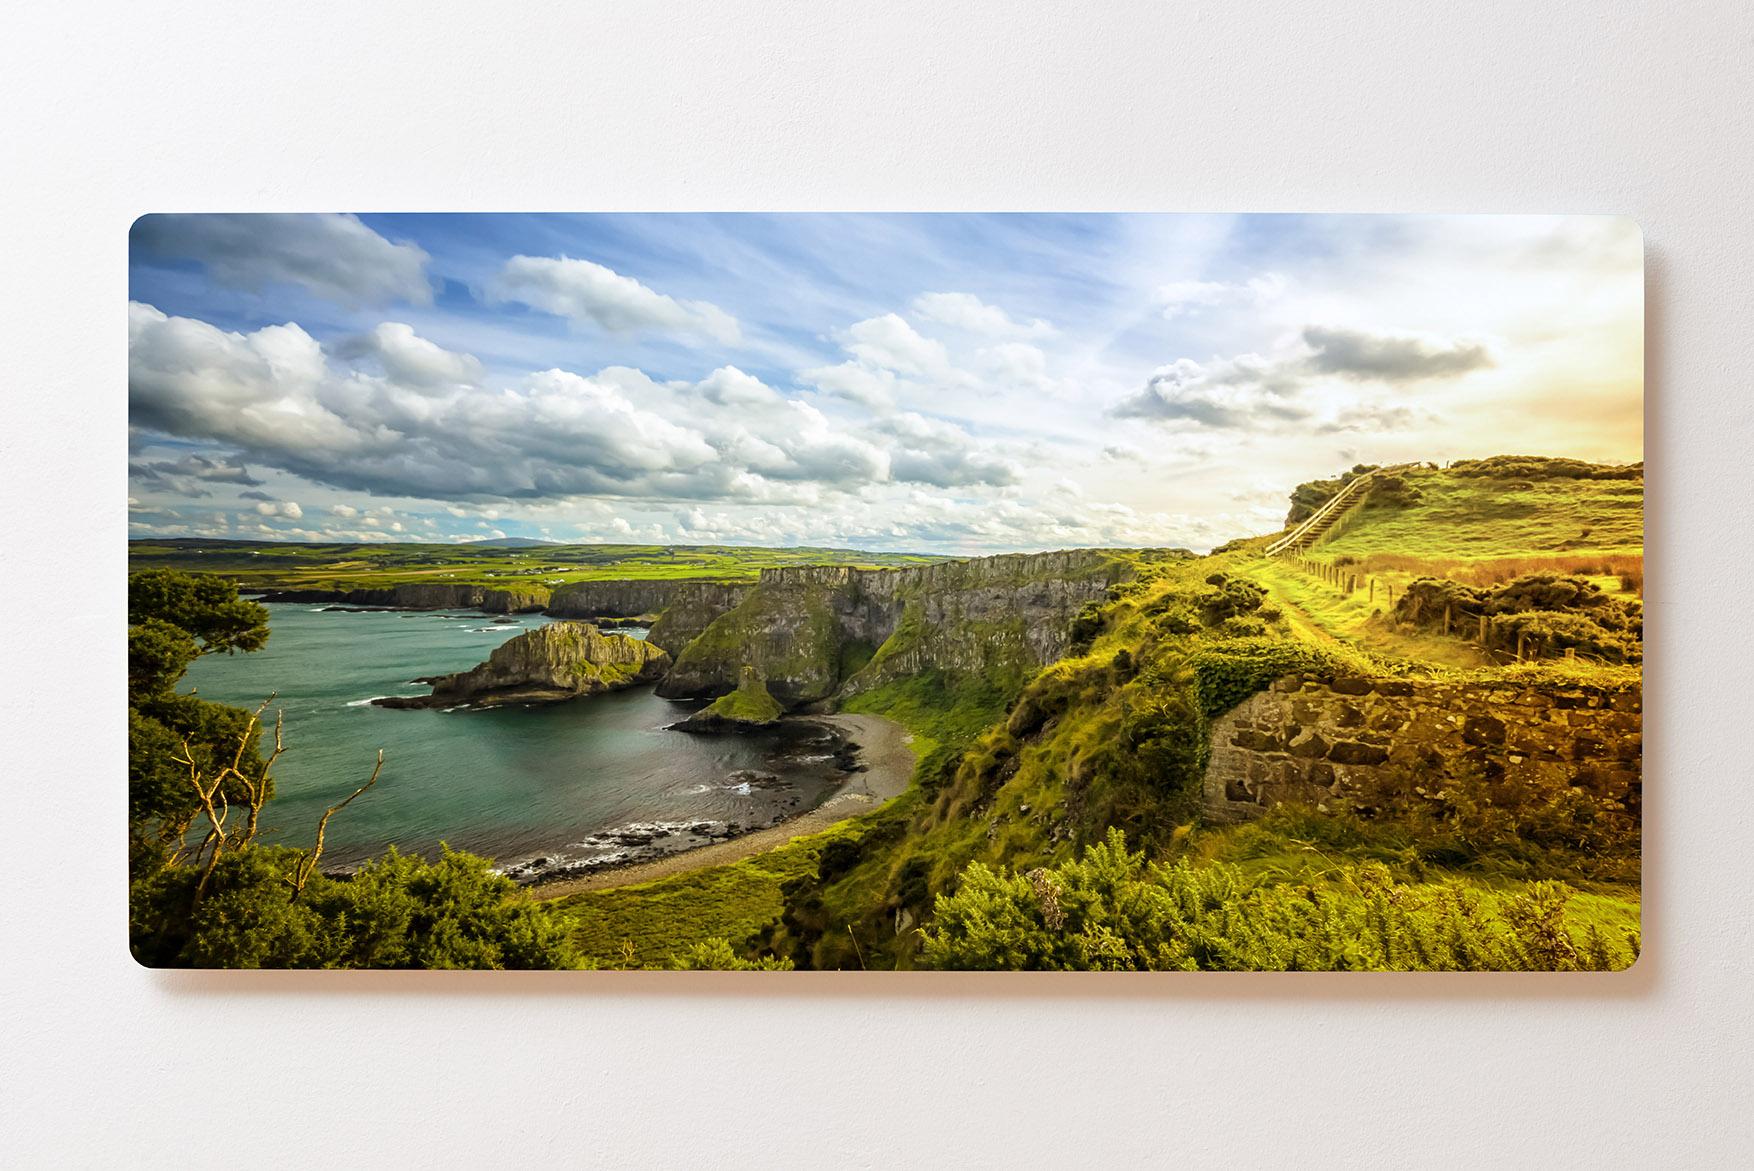 Magnettafel BACKLIGHT 120x60cm Motiv-Wandbild M150 Küste Wiese Meer